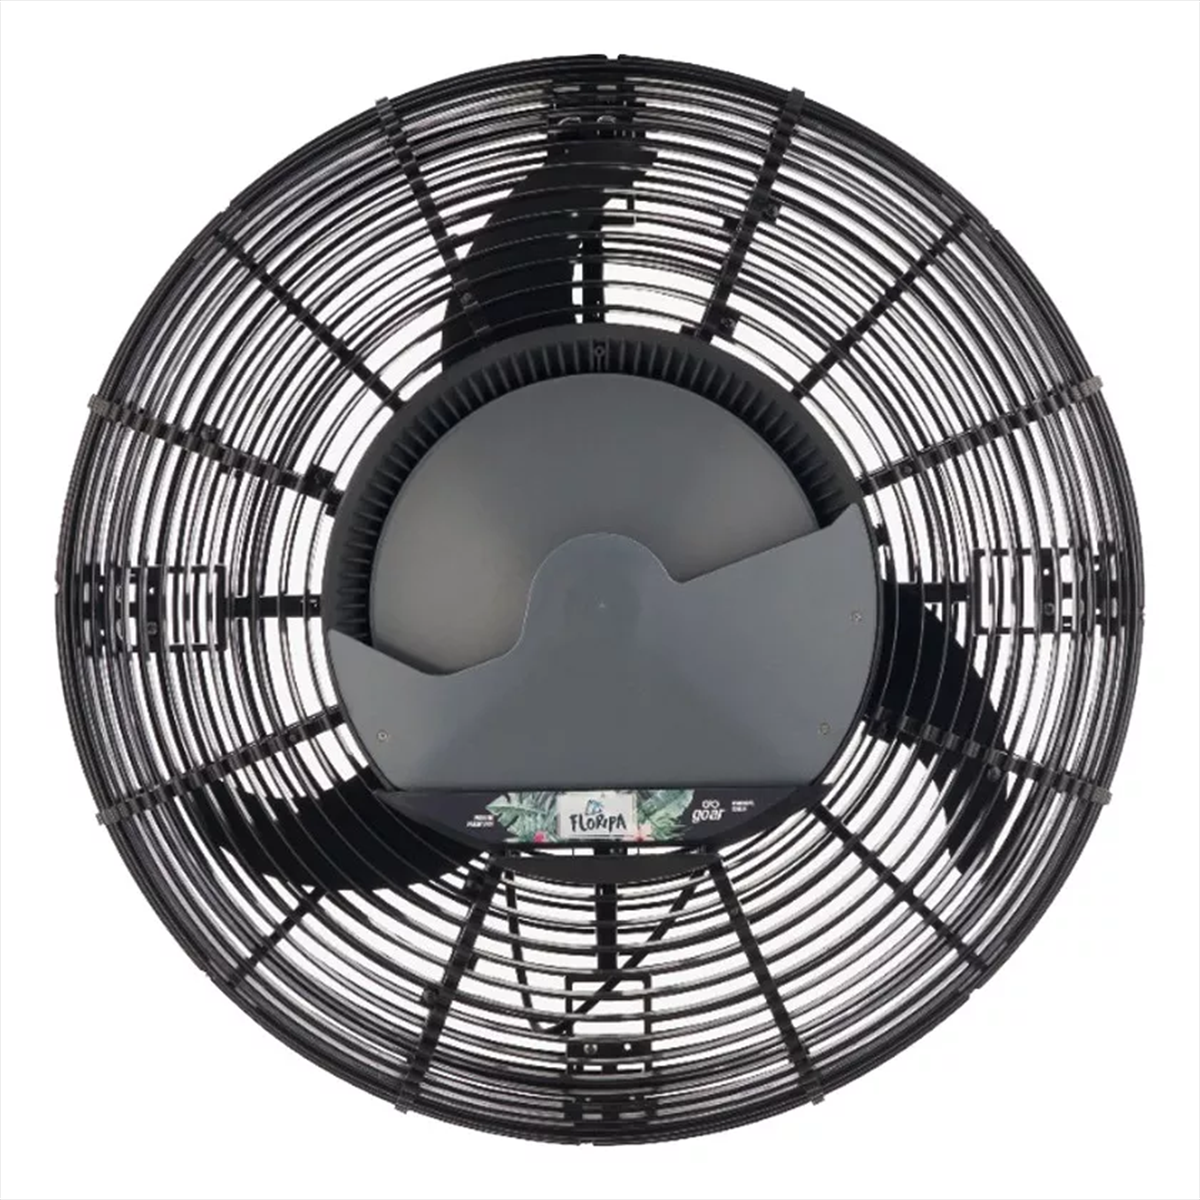 Climatizador Ventilador De Parede Goar Floripa 70cm - LCGELETRO